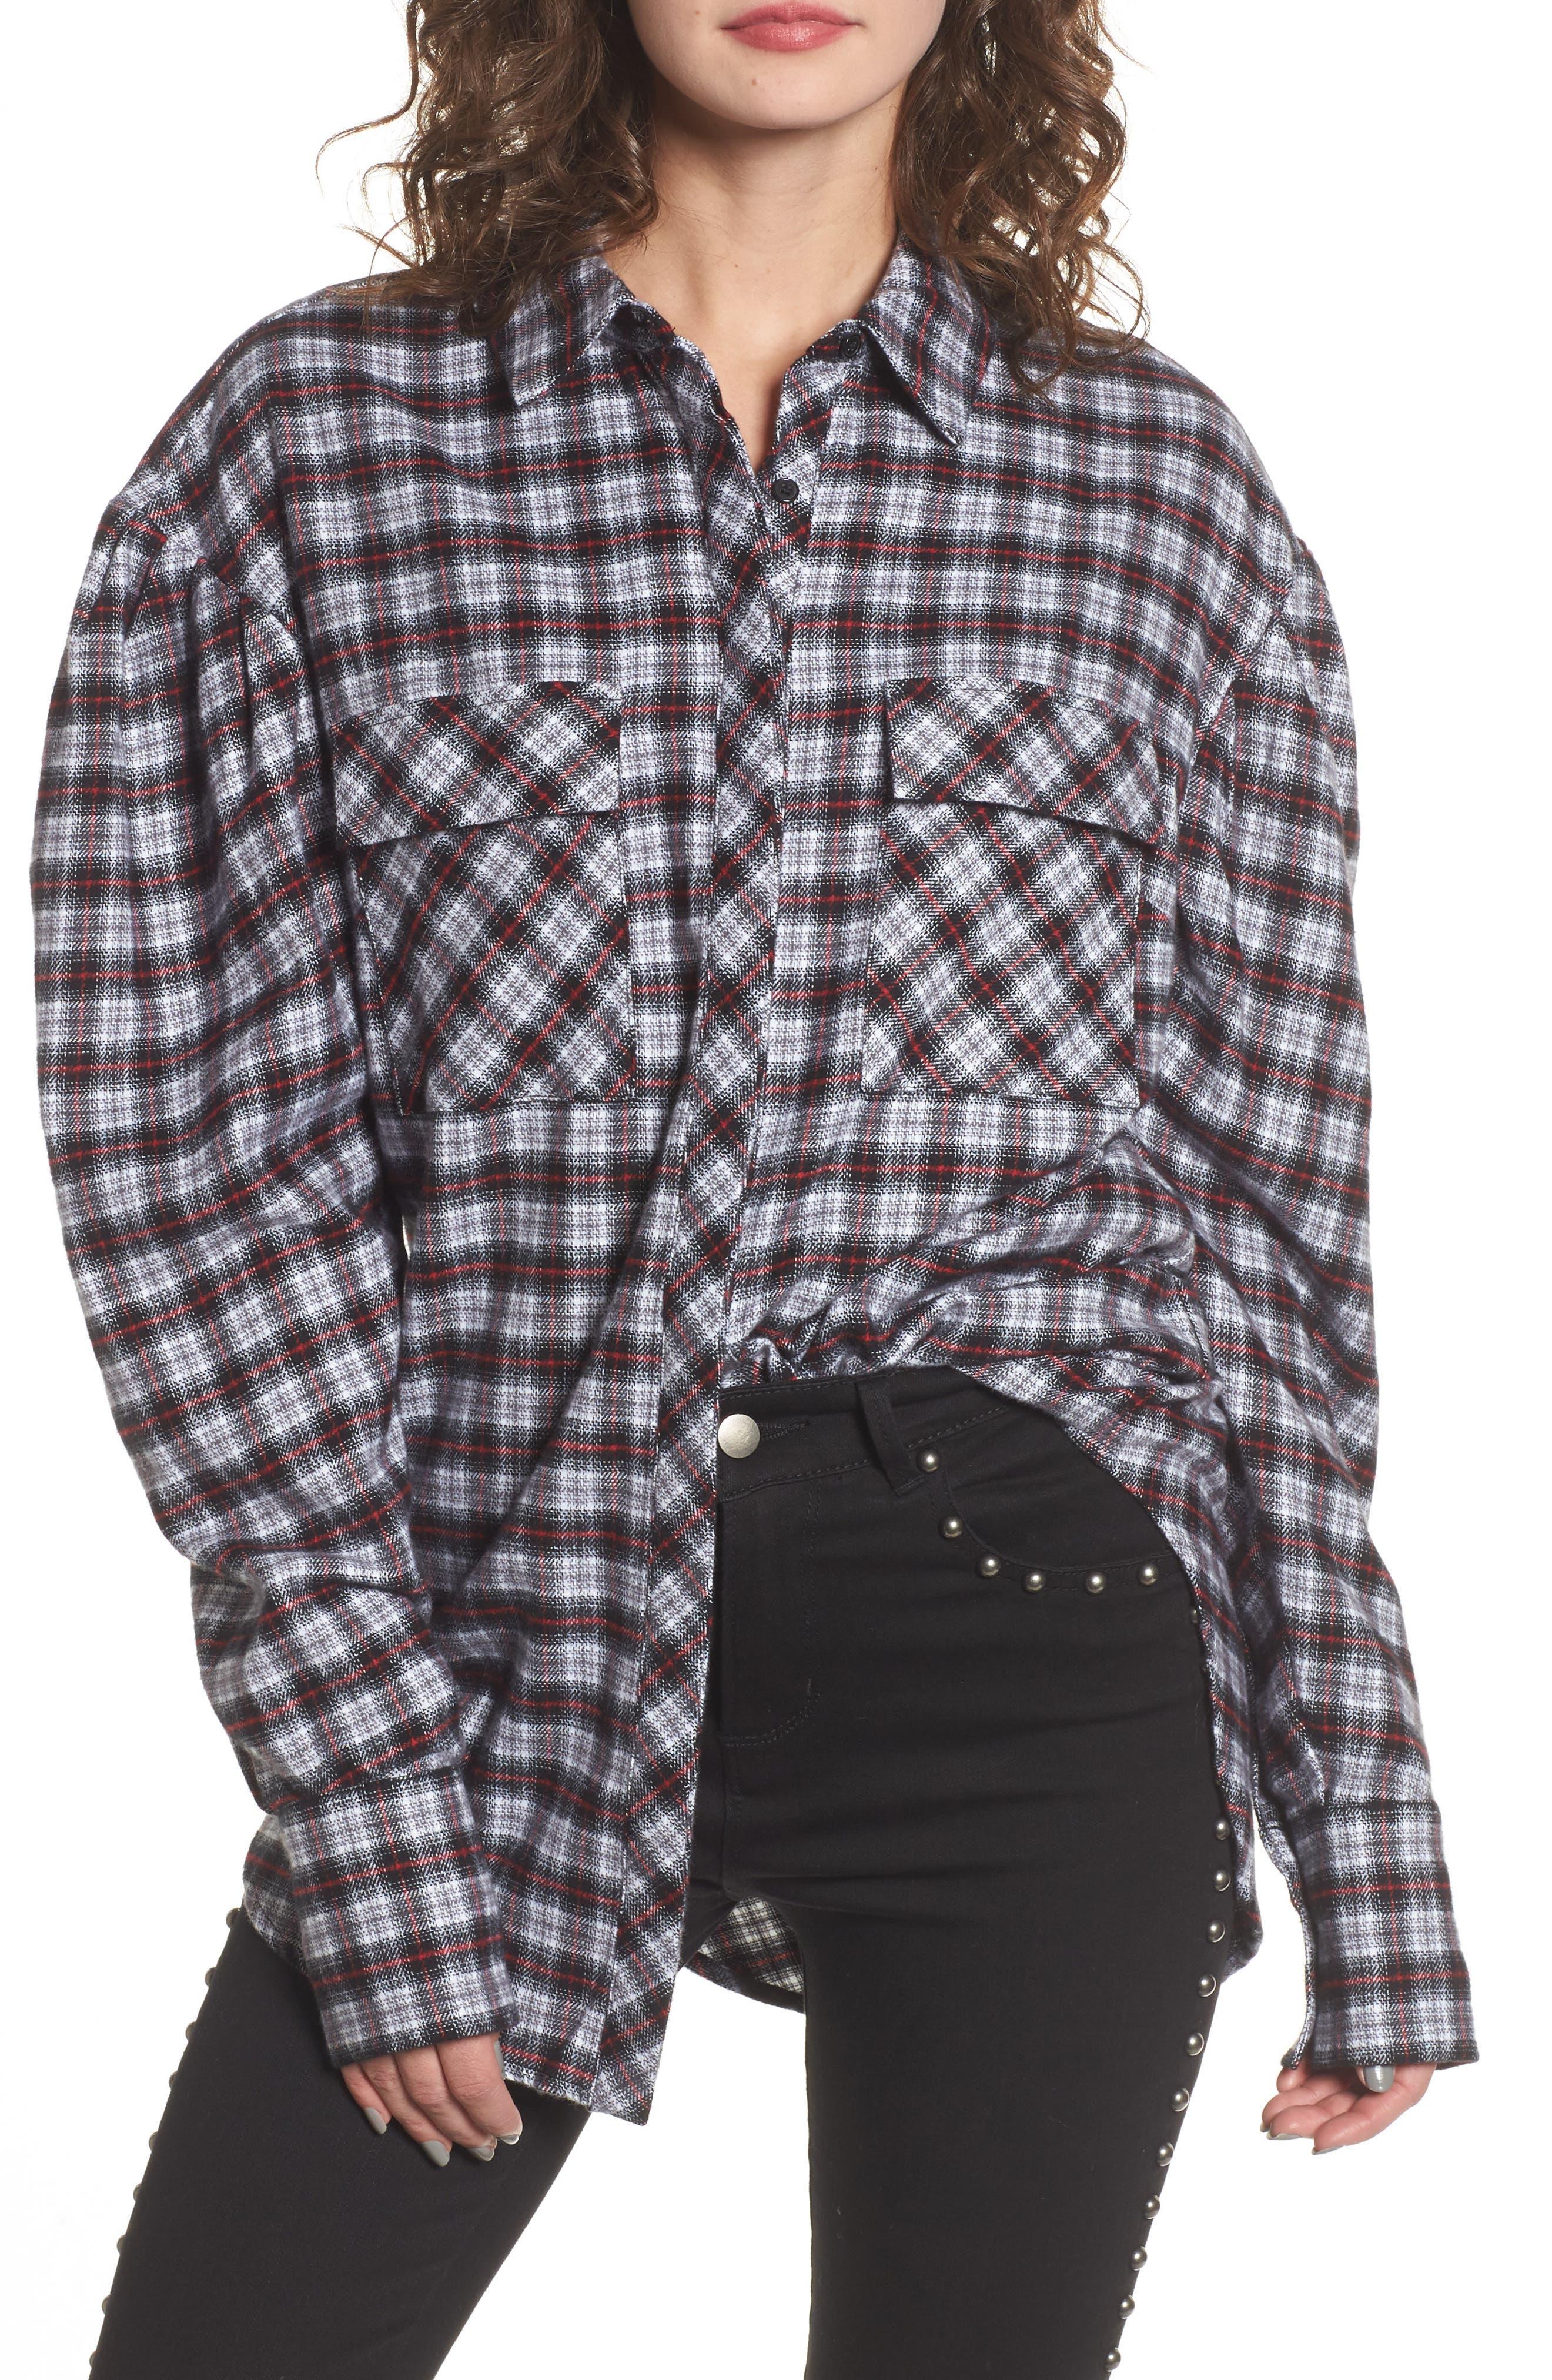 Alternate Image 1 Selected - AFRM Victoria Oversize Flannel Shirt